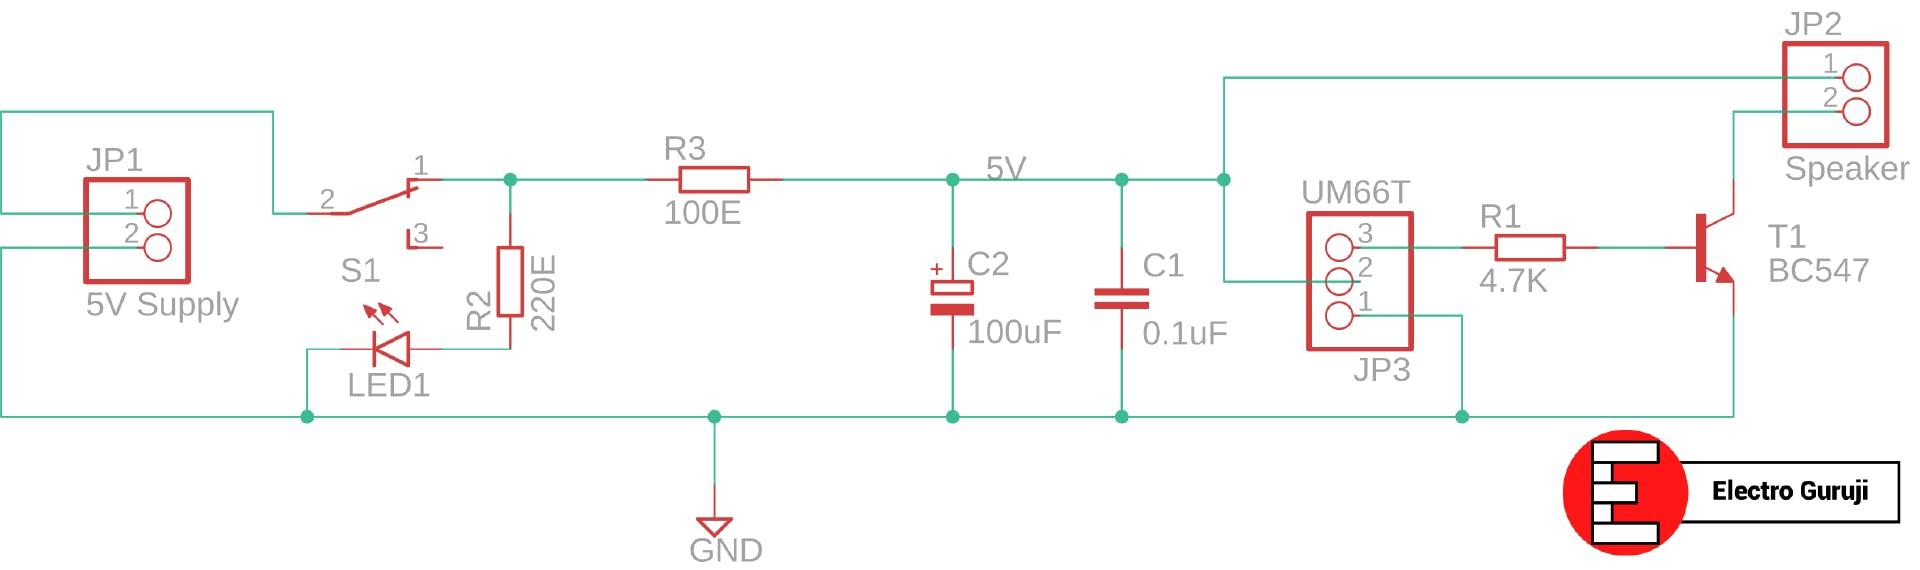 UM66 Musical Bell Circuit Schematic